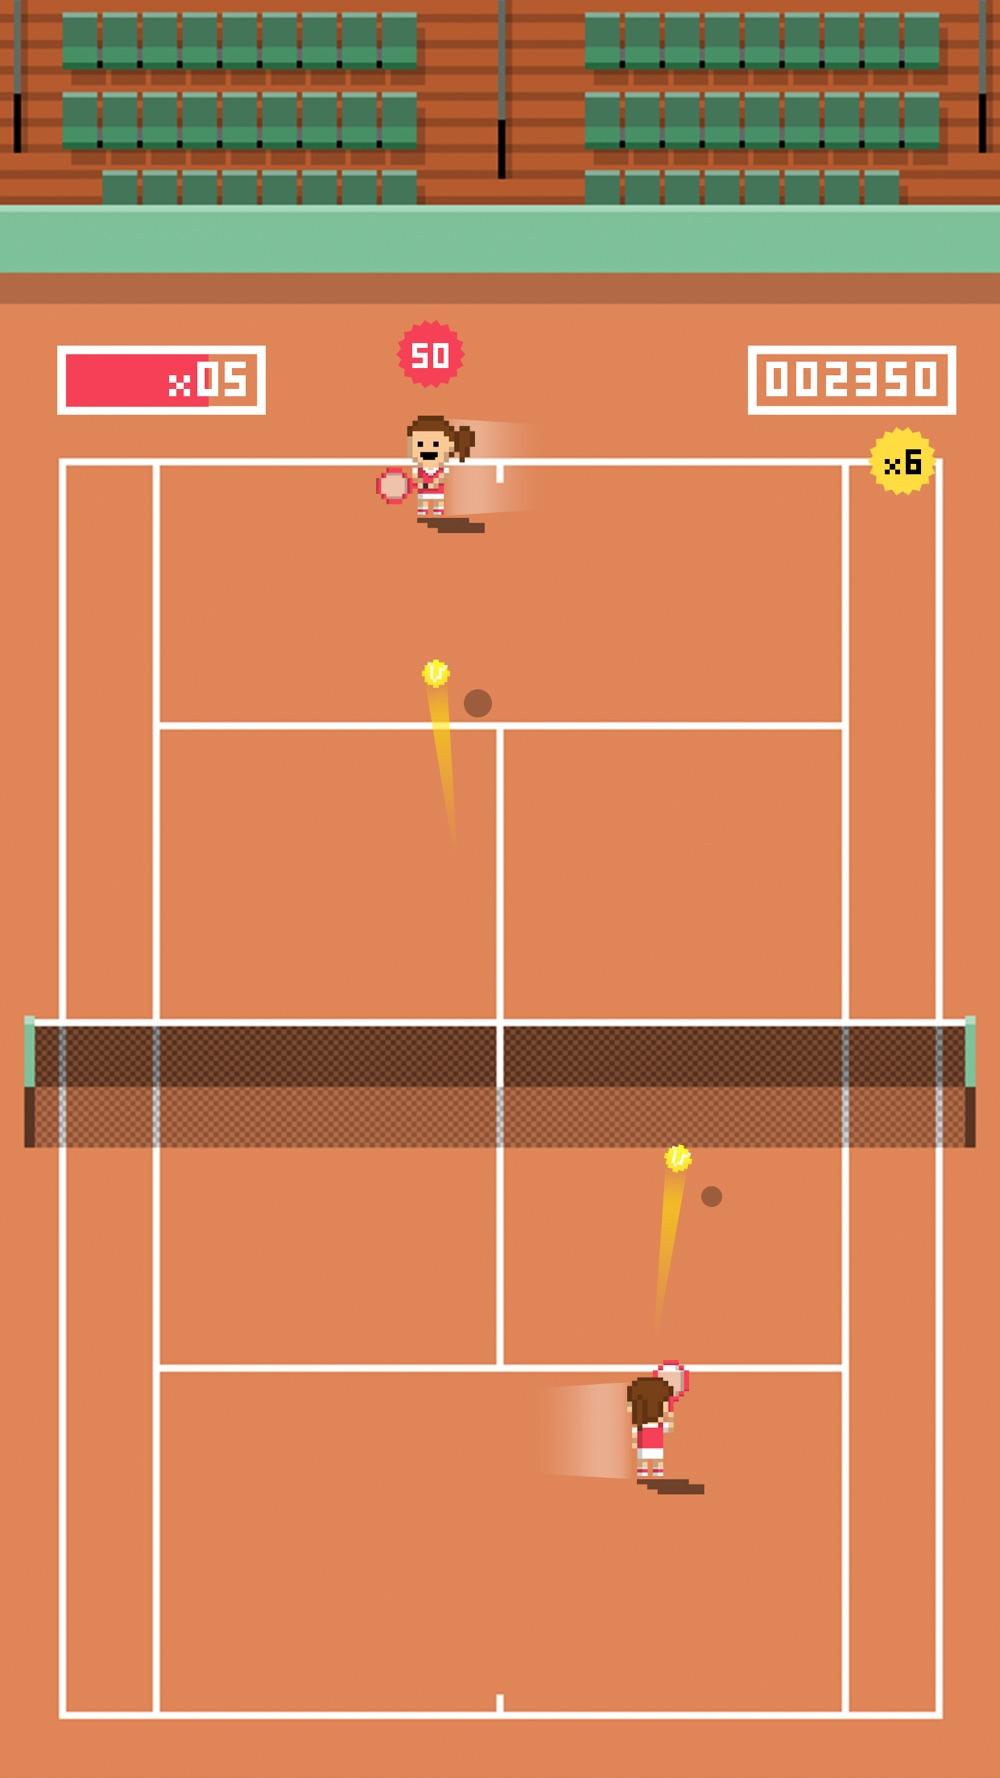 Tiny Tennis hack tool